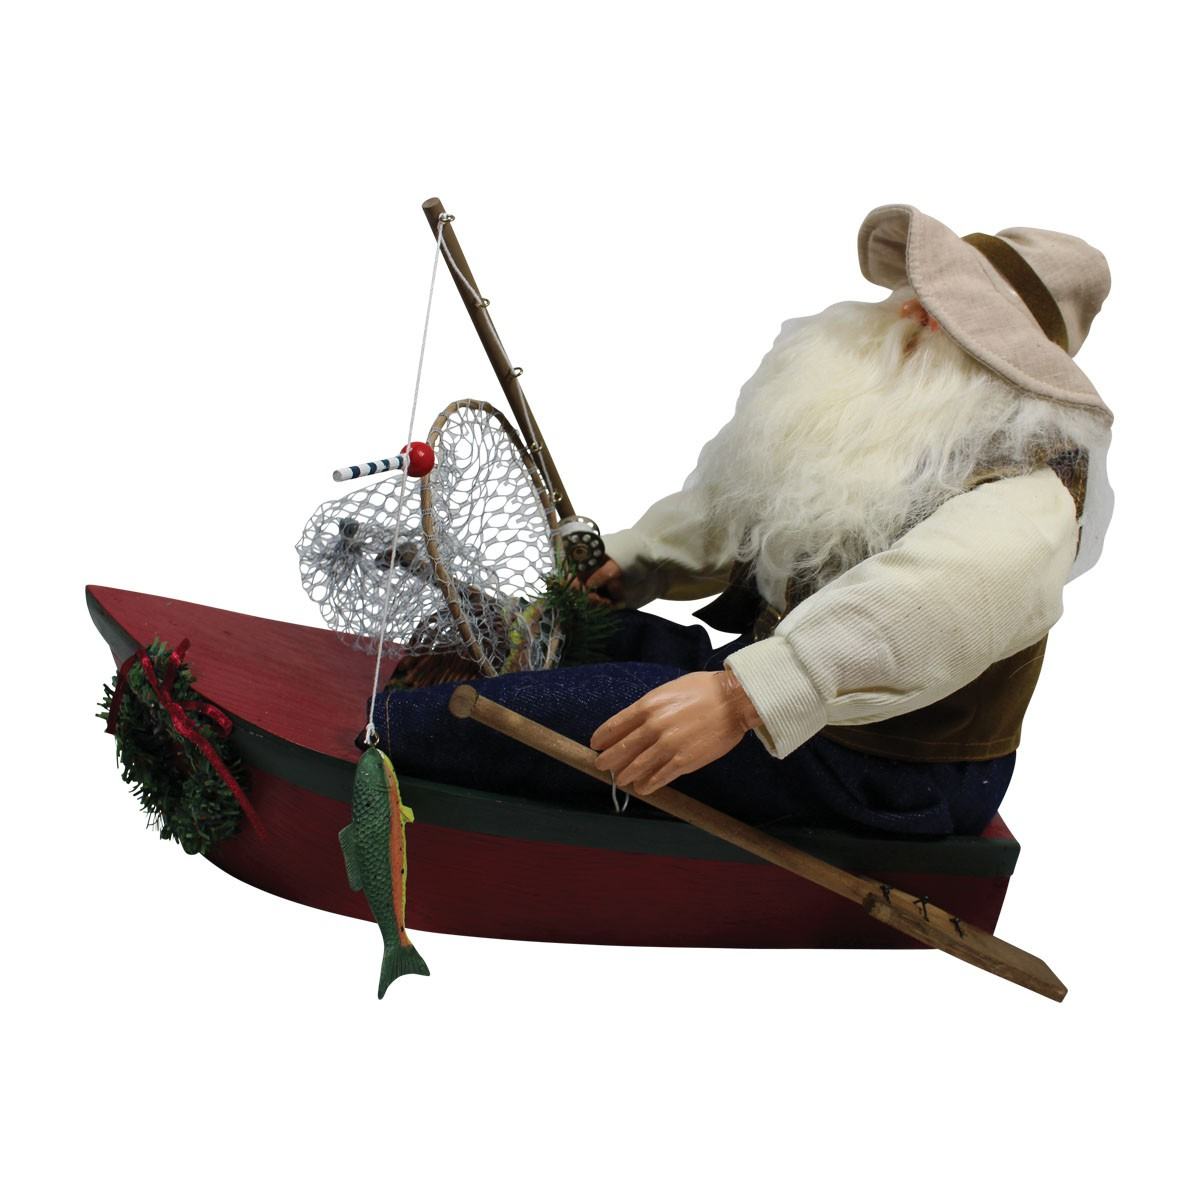 Santa Fishing Centerpiece Resin Decorative 11H Santa Decor Christmas Decor Christmas Decorations